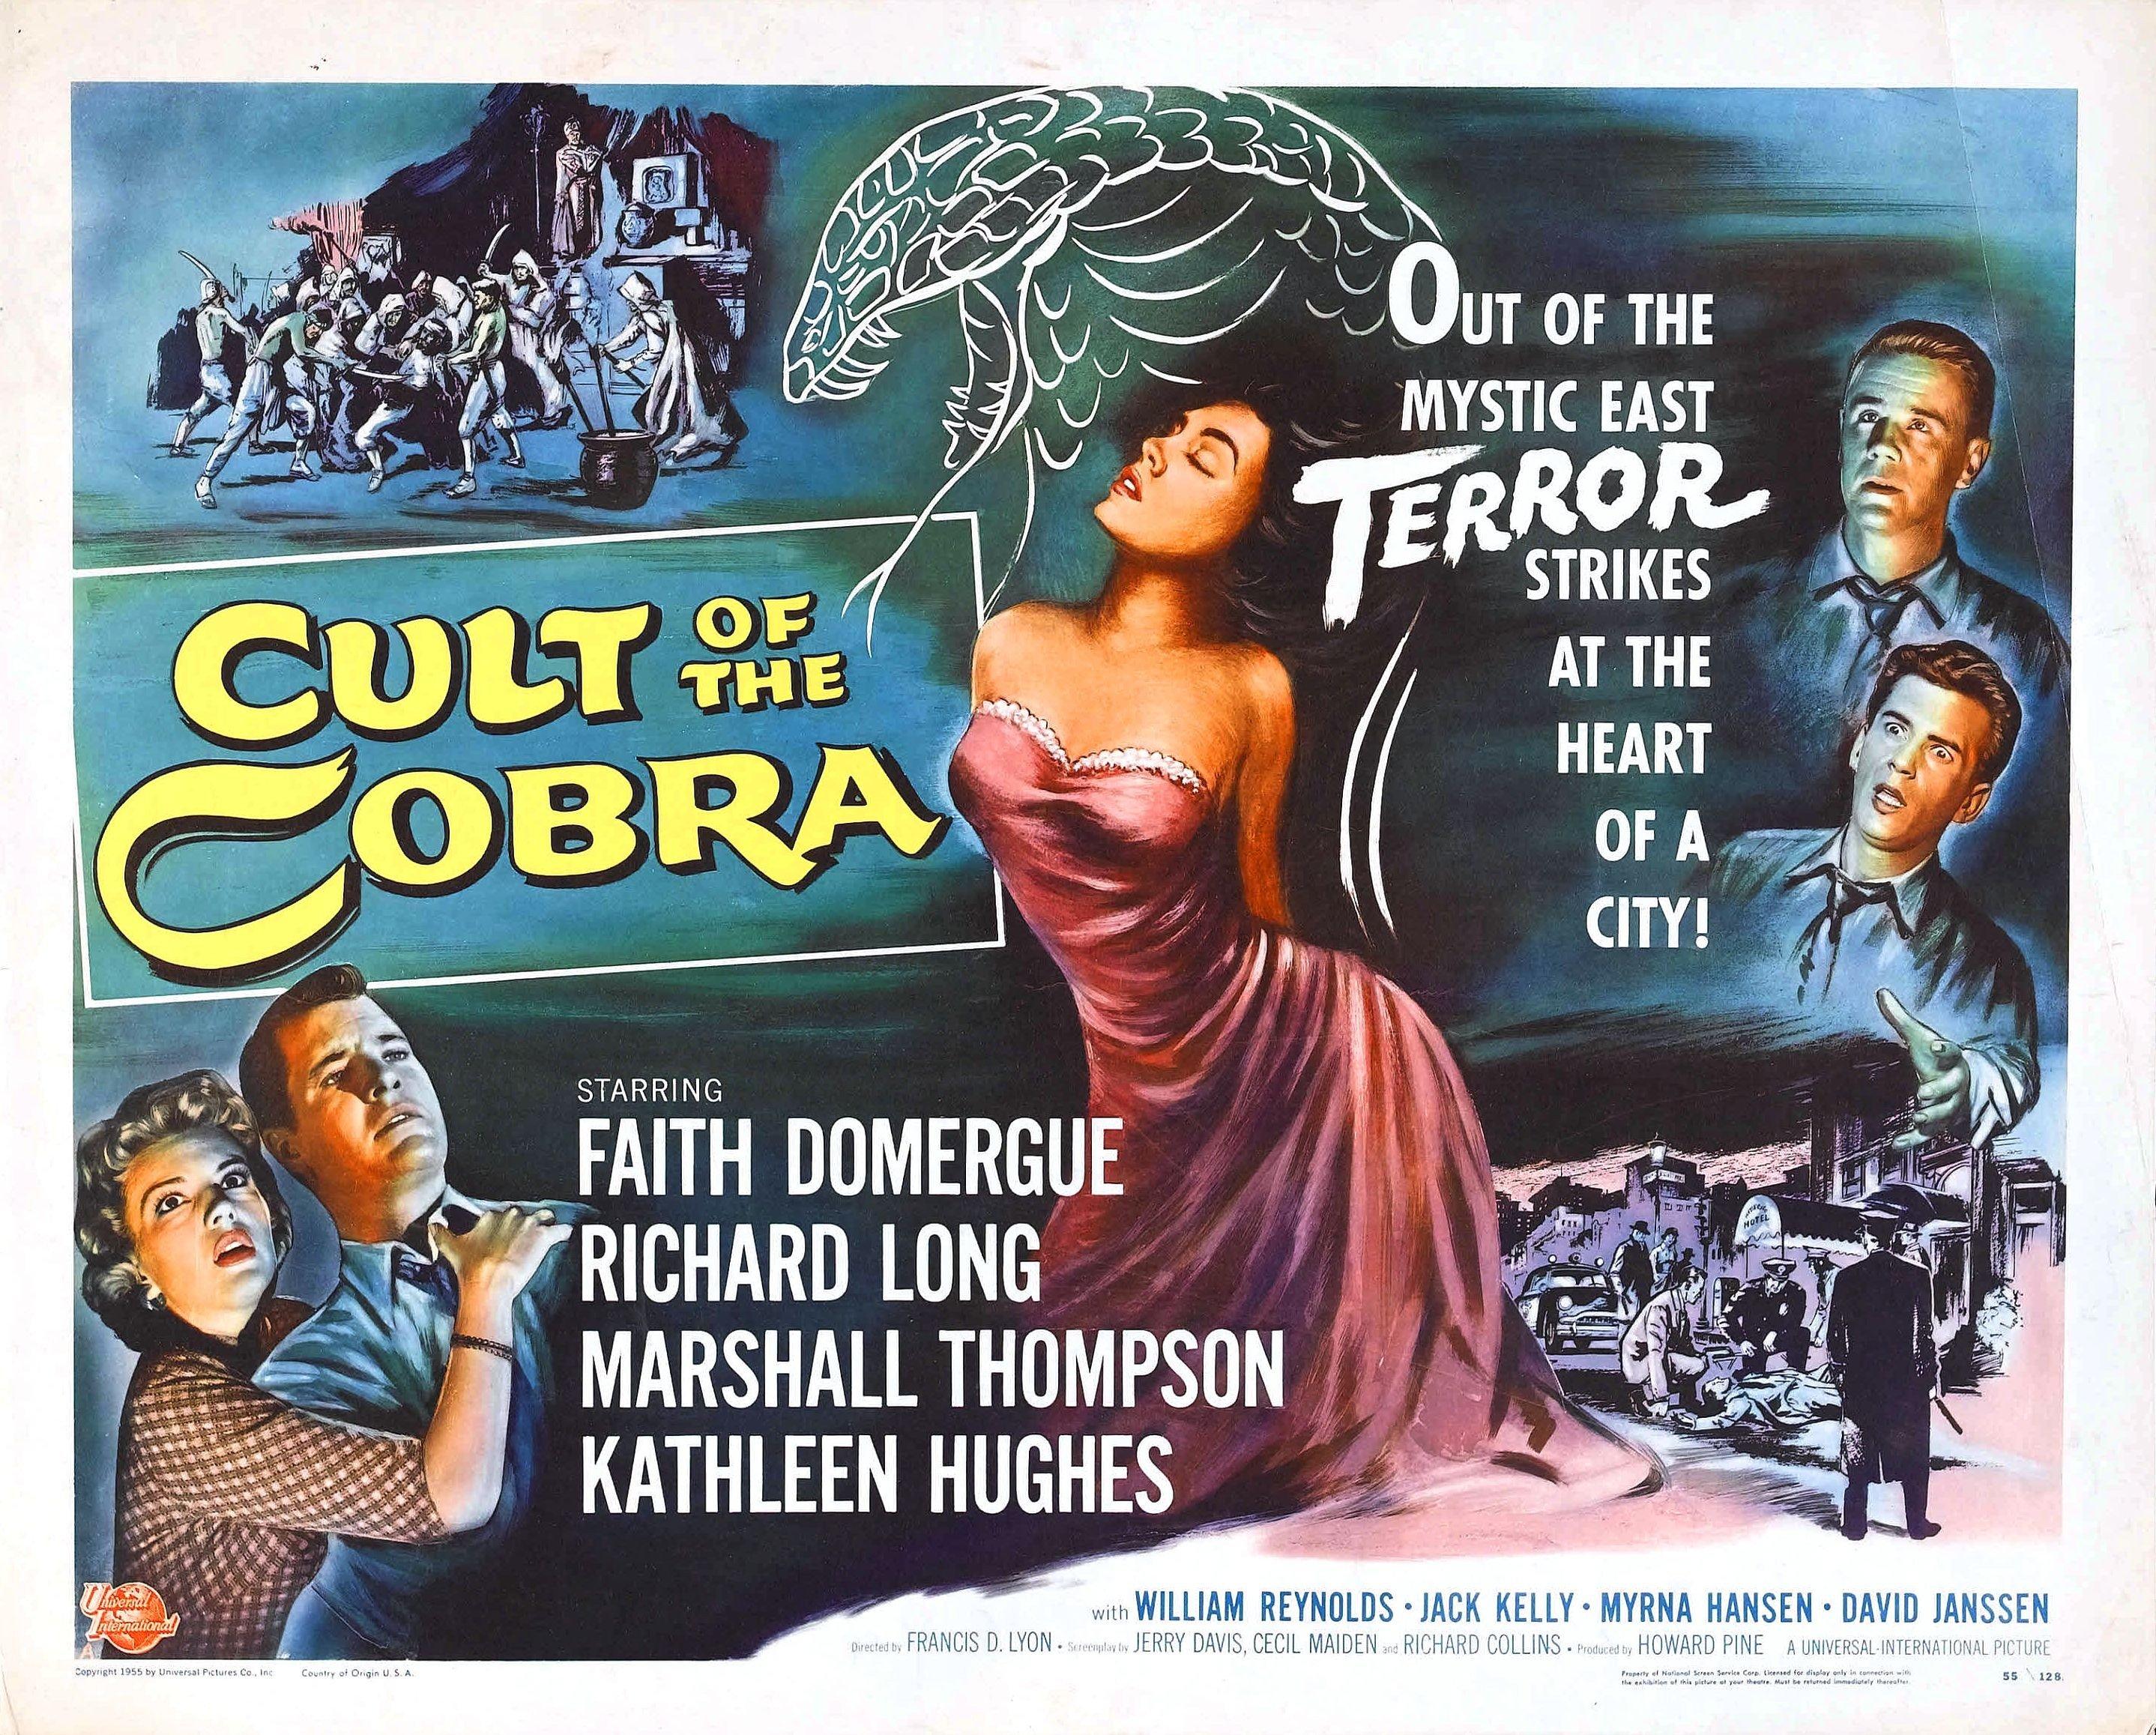 poster movie film movies posters retro vintage classic